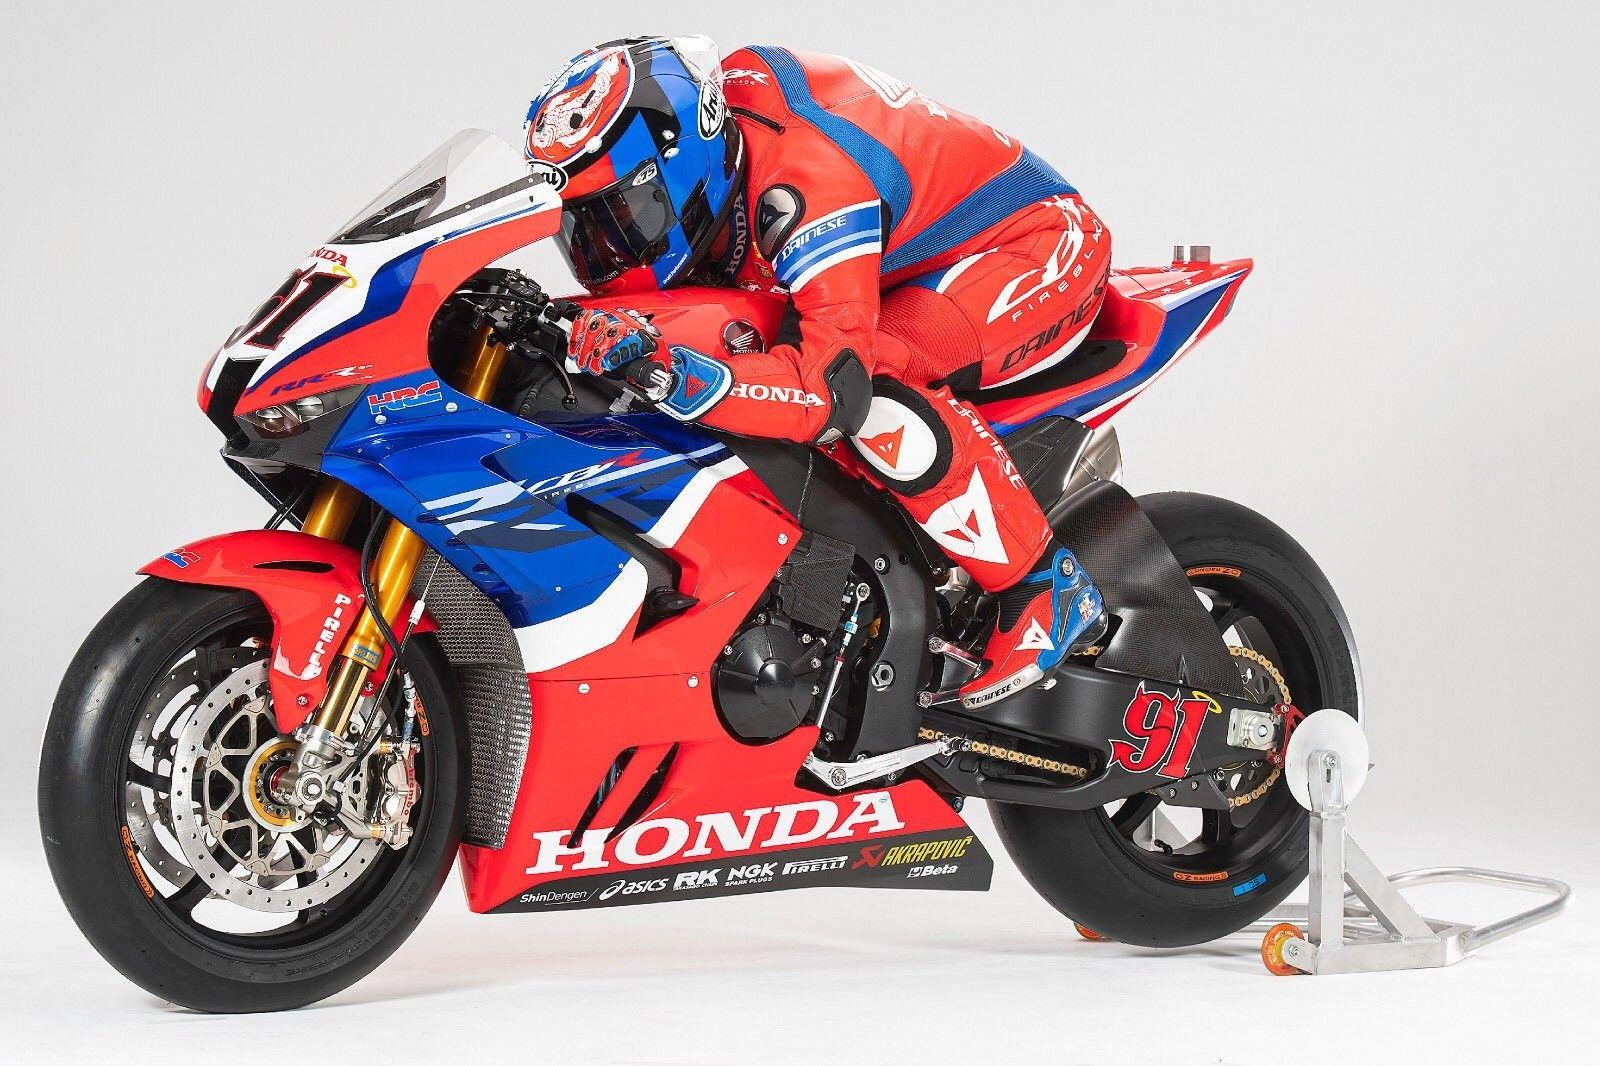 Pin By Jim Reynolds On British World Superbikes In 2020 Pics British Motorcycle